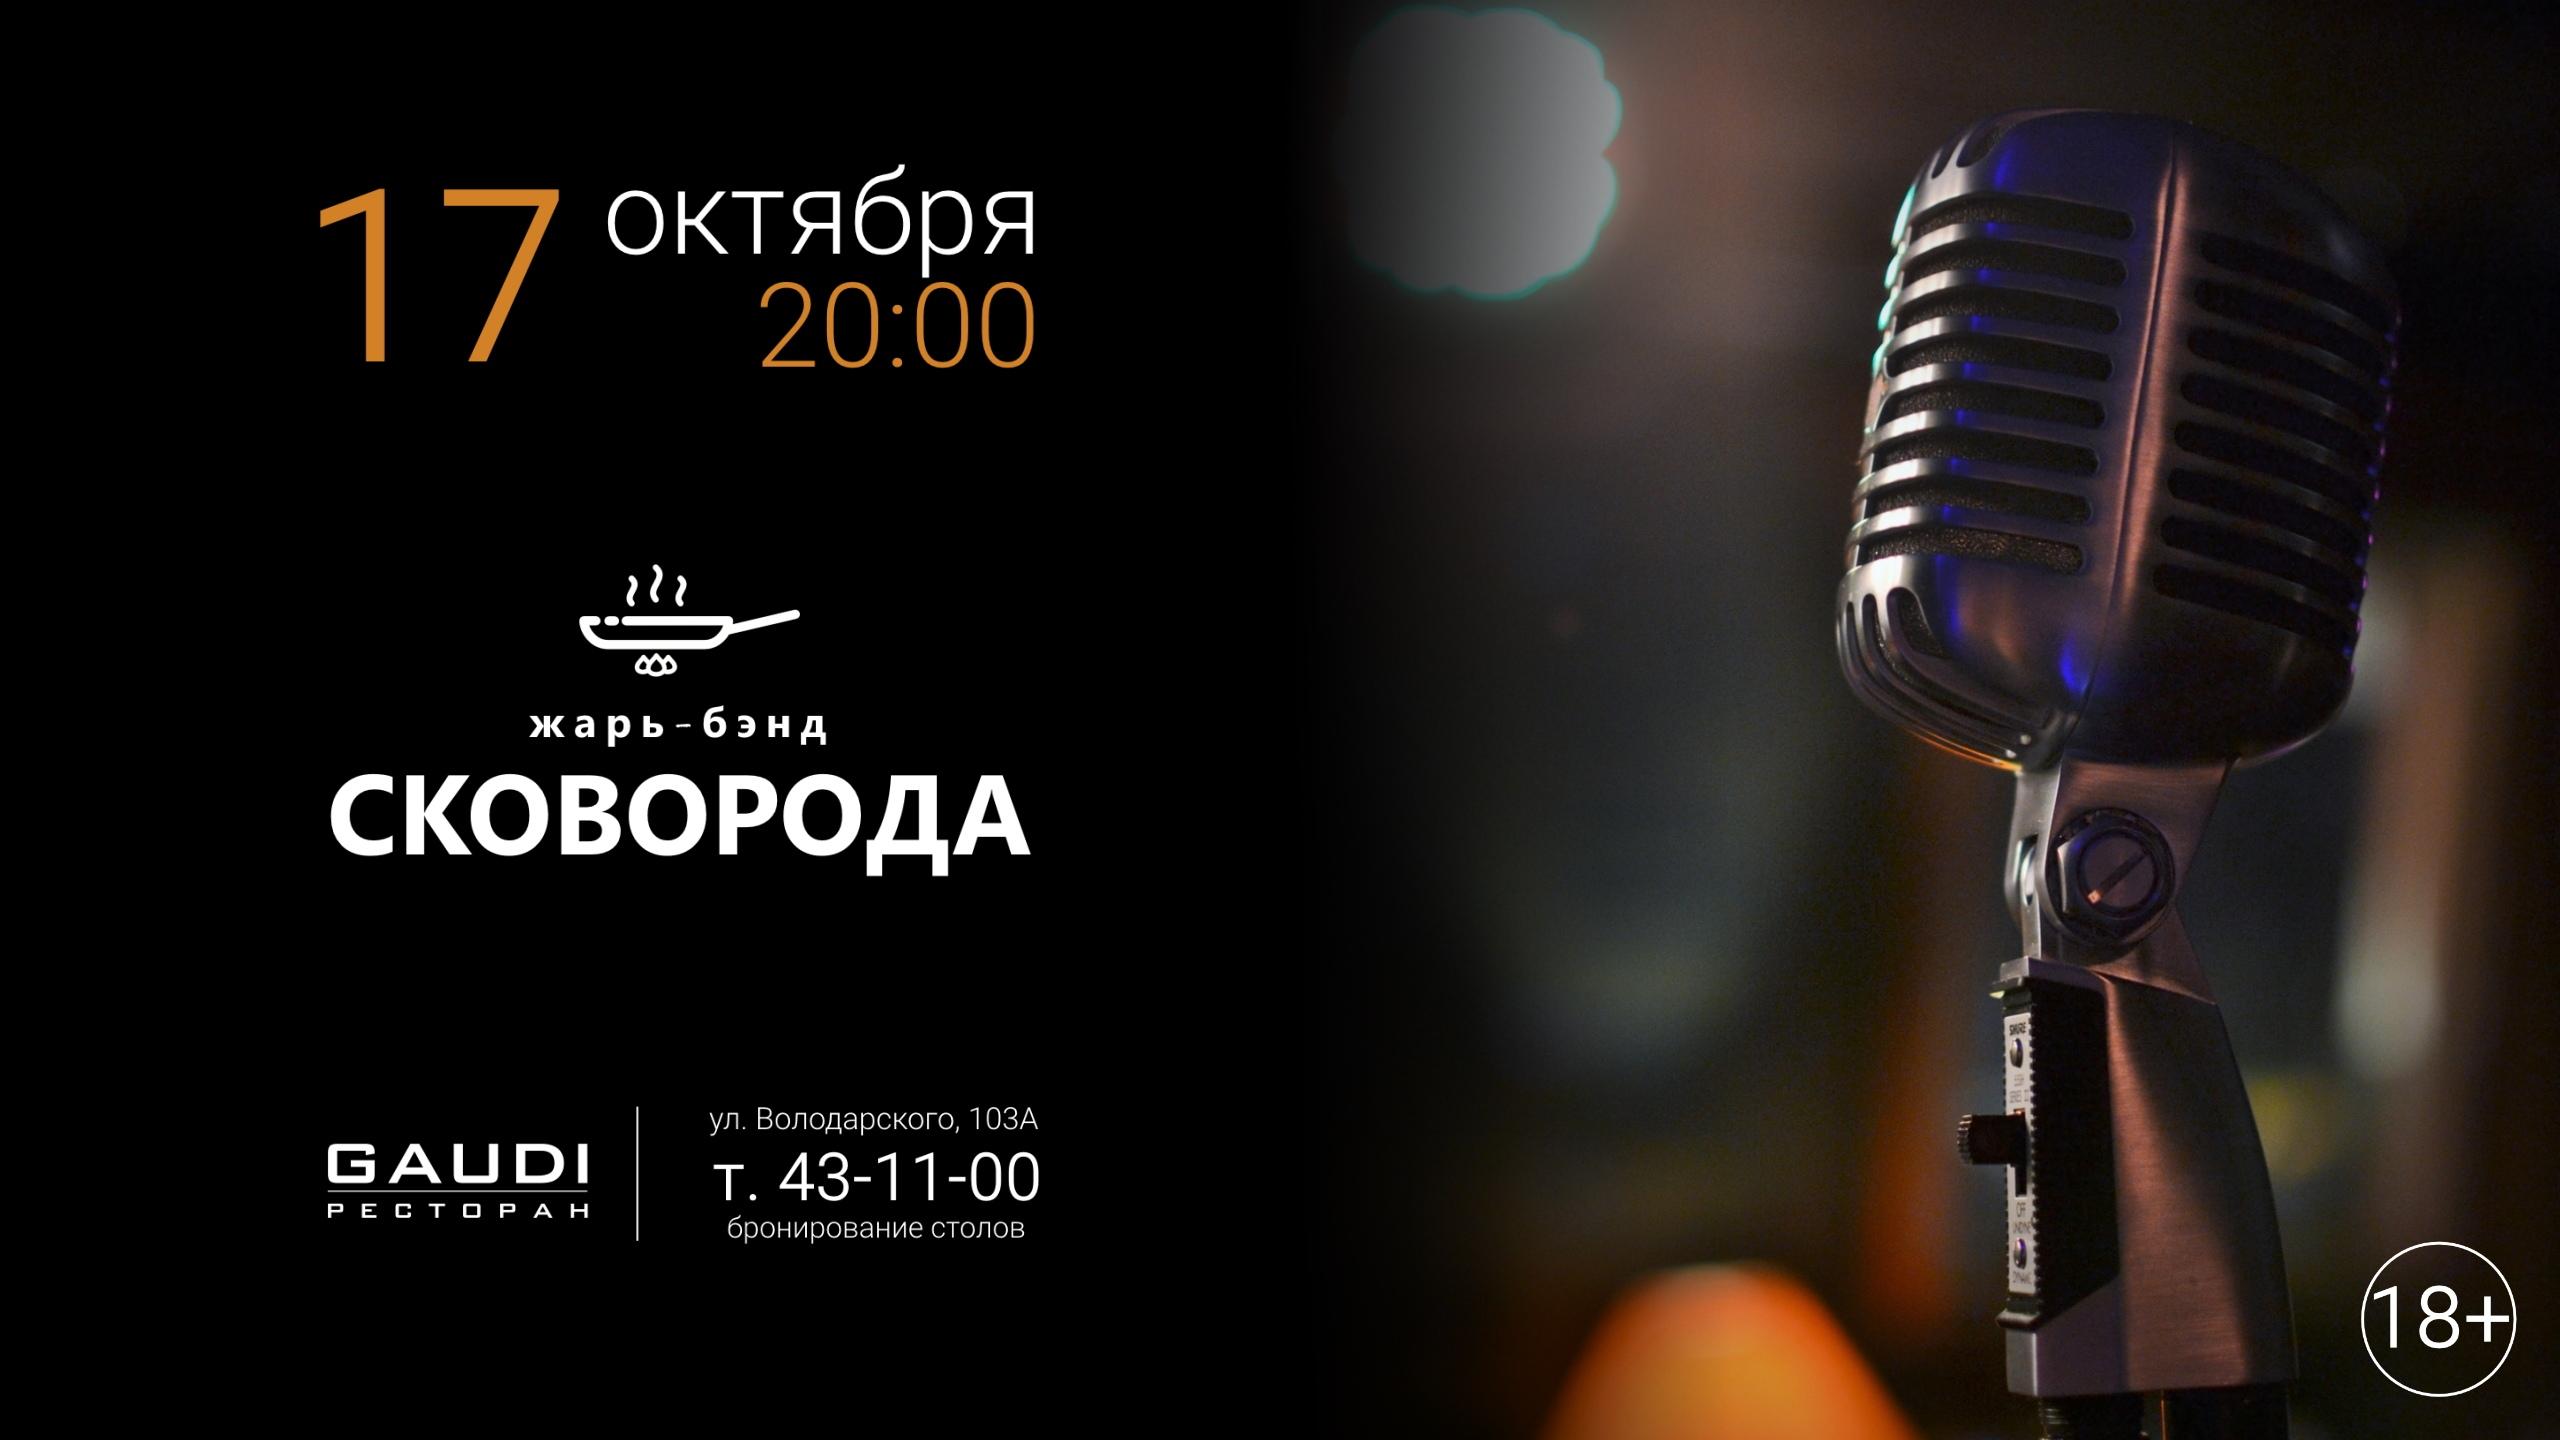 Ресторан «GAUDI» - Вконтакте